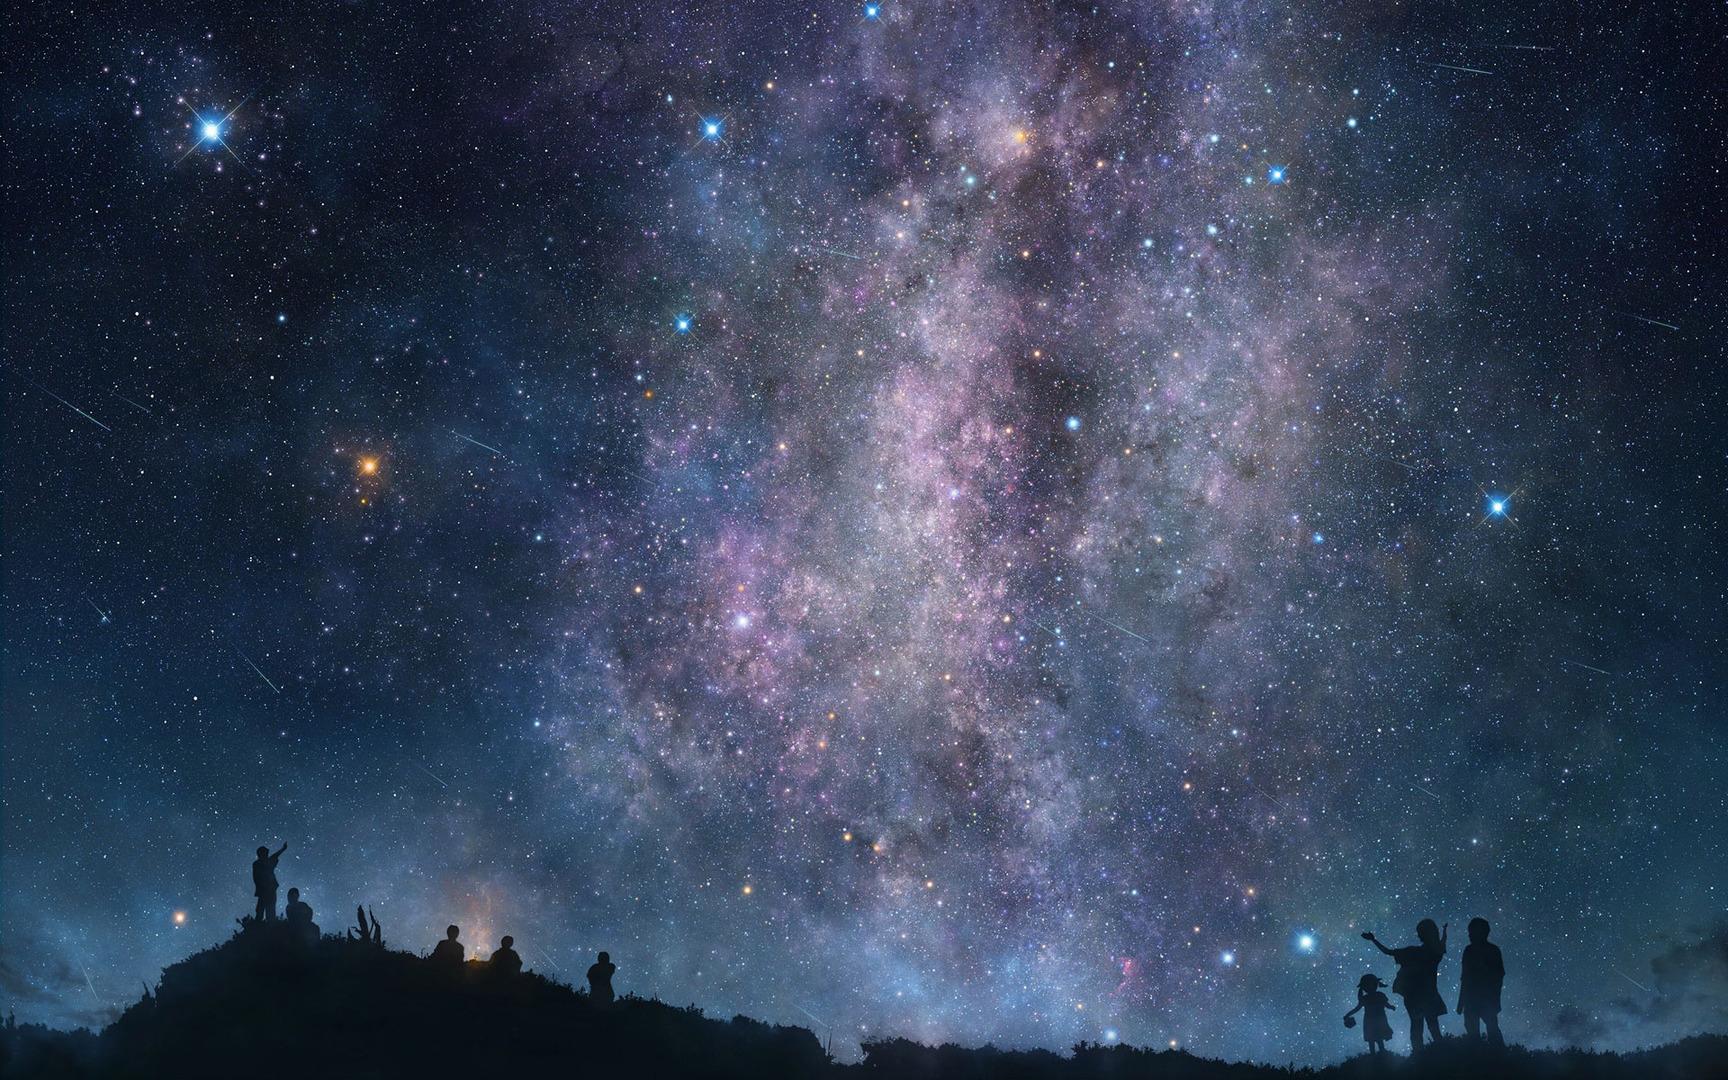 Night sky wallpaper 18397 1728x1080